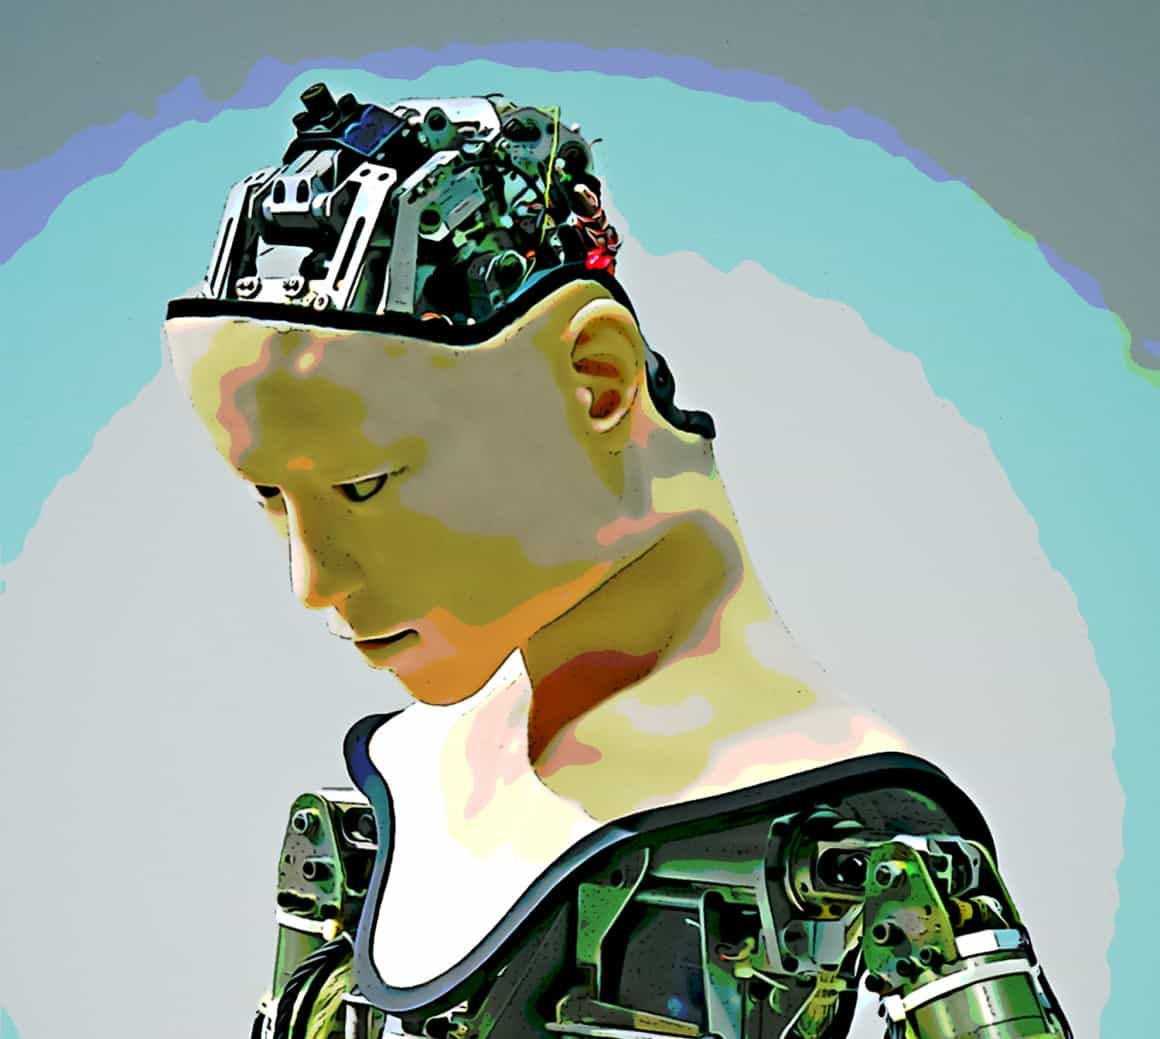 robot health care